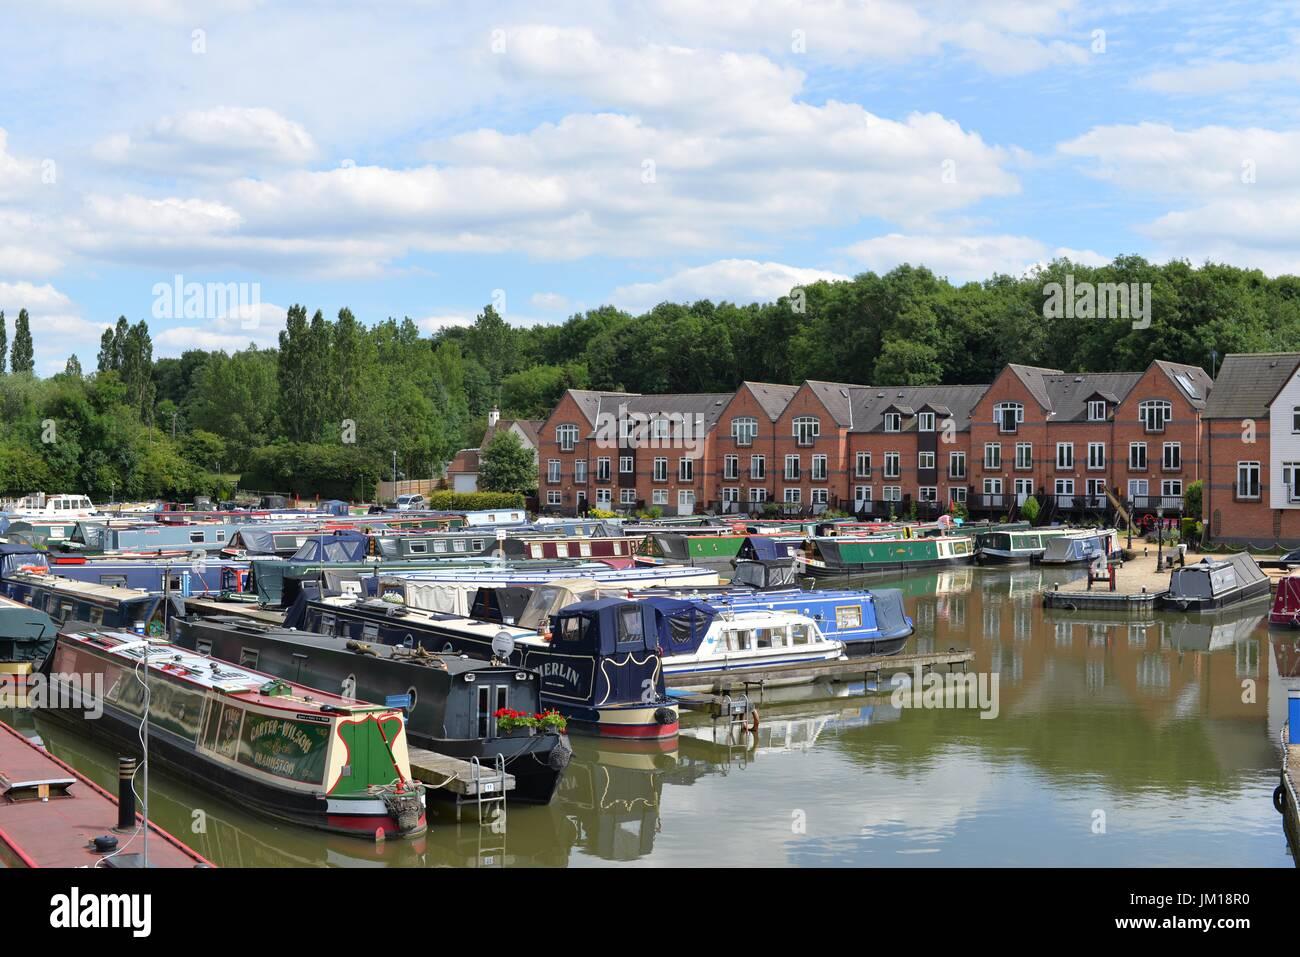 Braunston Marina, Daventry, Northamptonshire - Stock Image